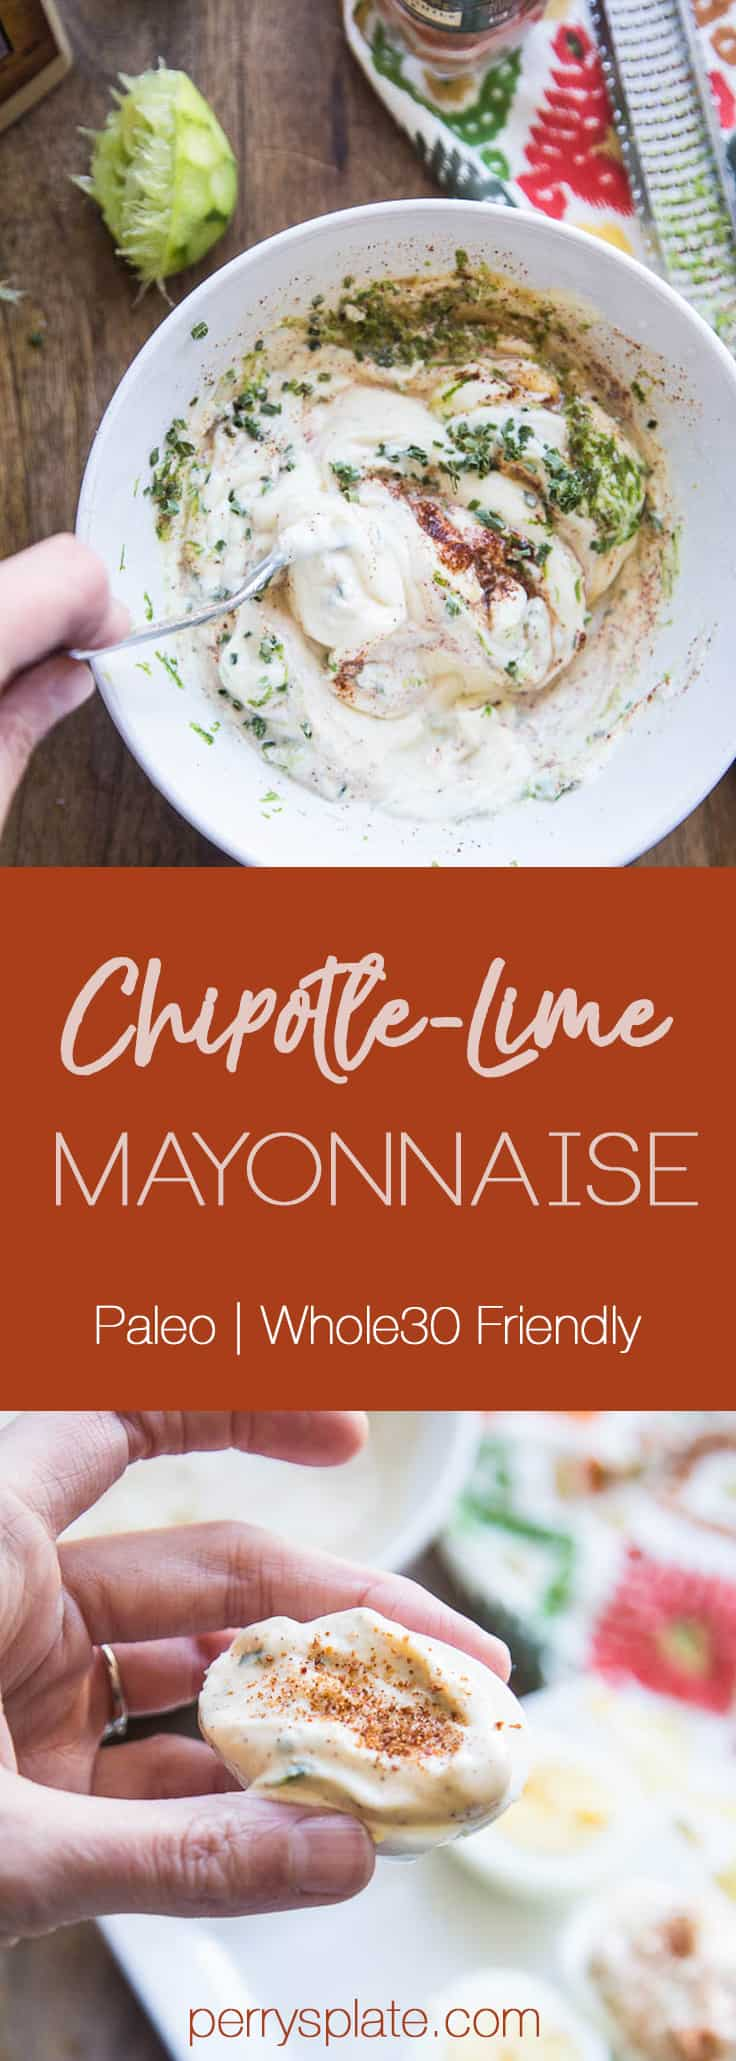 Chipotle-Lime Mayonnaise | paleo recipes | homemade mayo | Whole30 recipes | Keto recipes | perrysplate.com